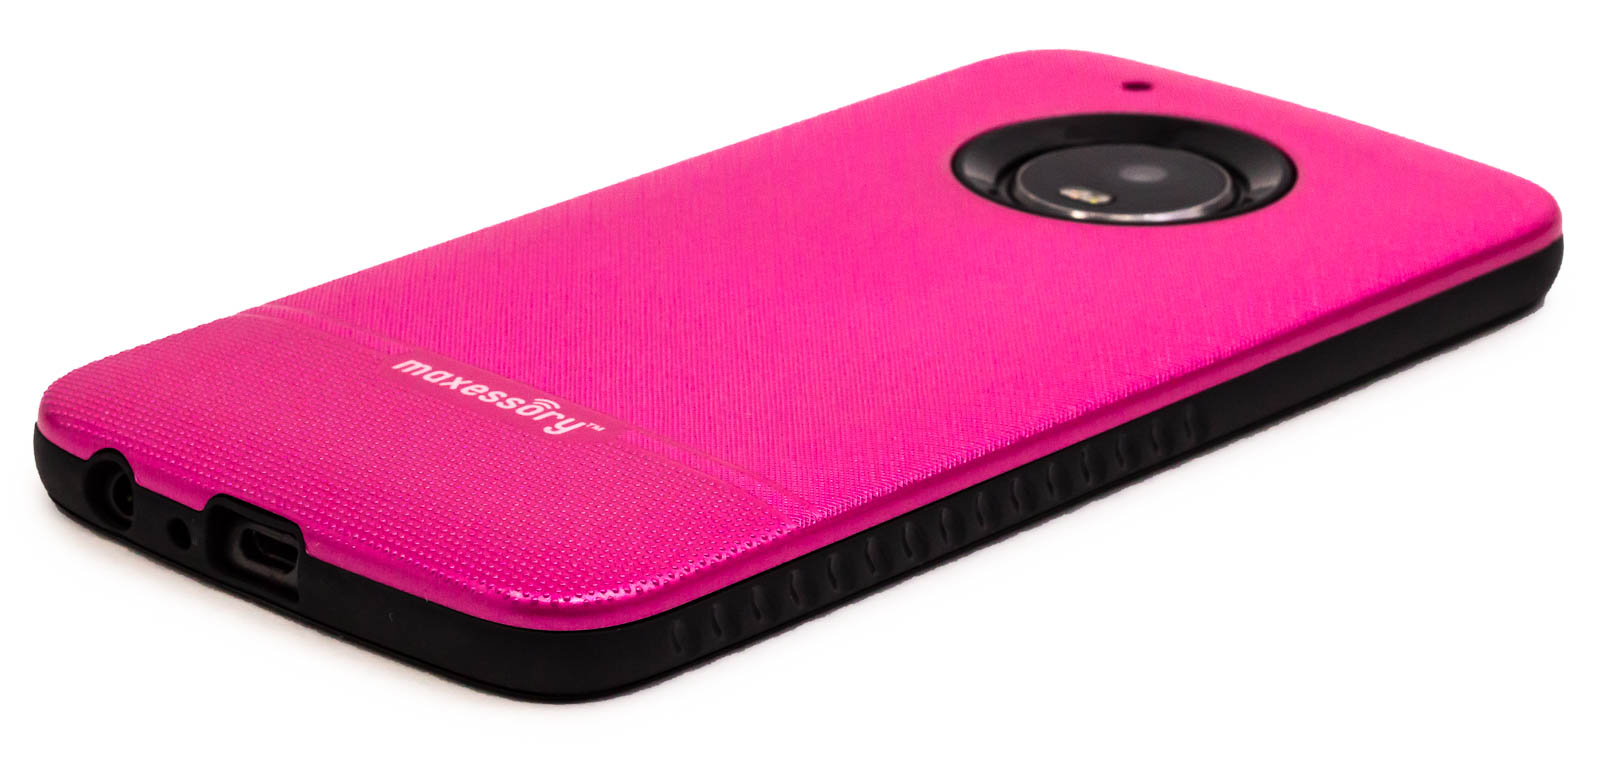 Moto-G5-Plus-Case-Moto-X-17-Case-Ultra-Thin-Hard-Body-Tactile-Shell-Cover thumbnail 15